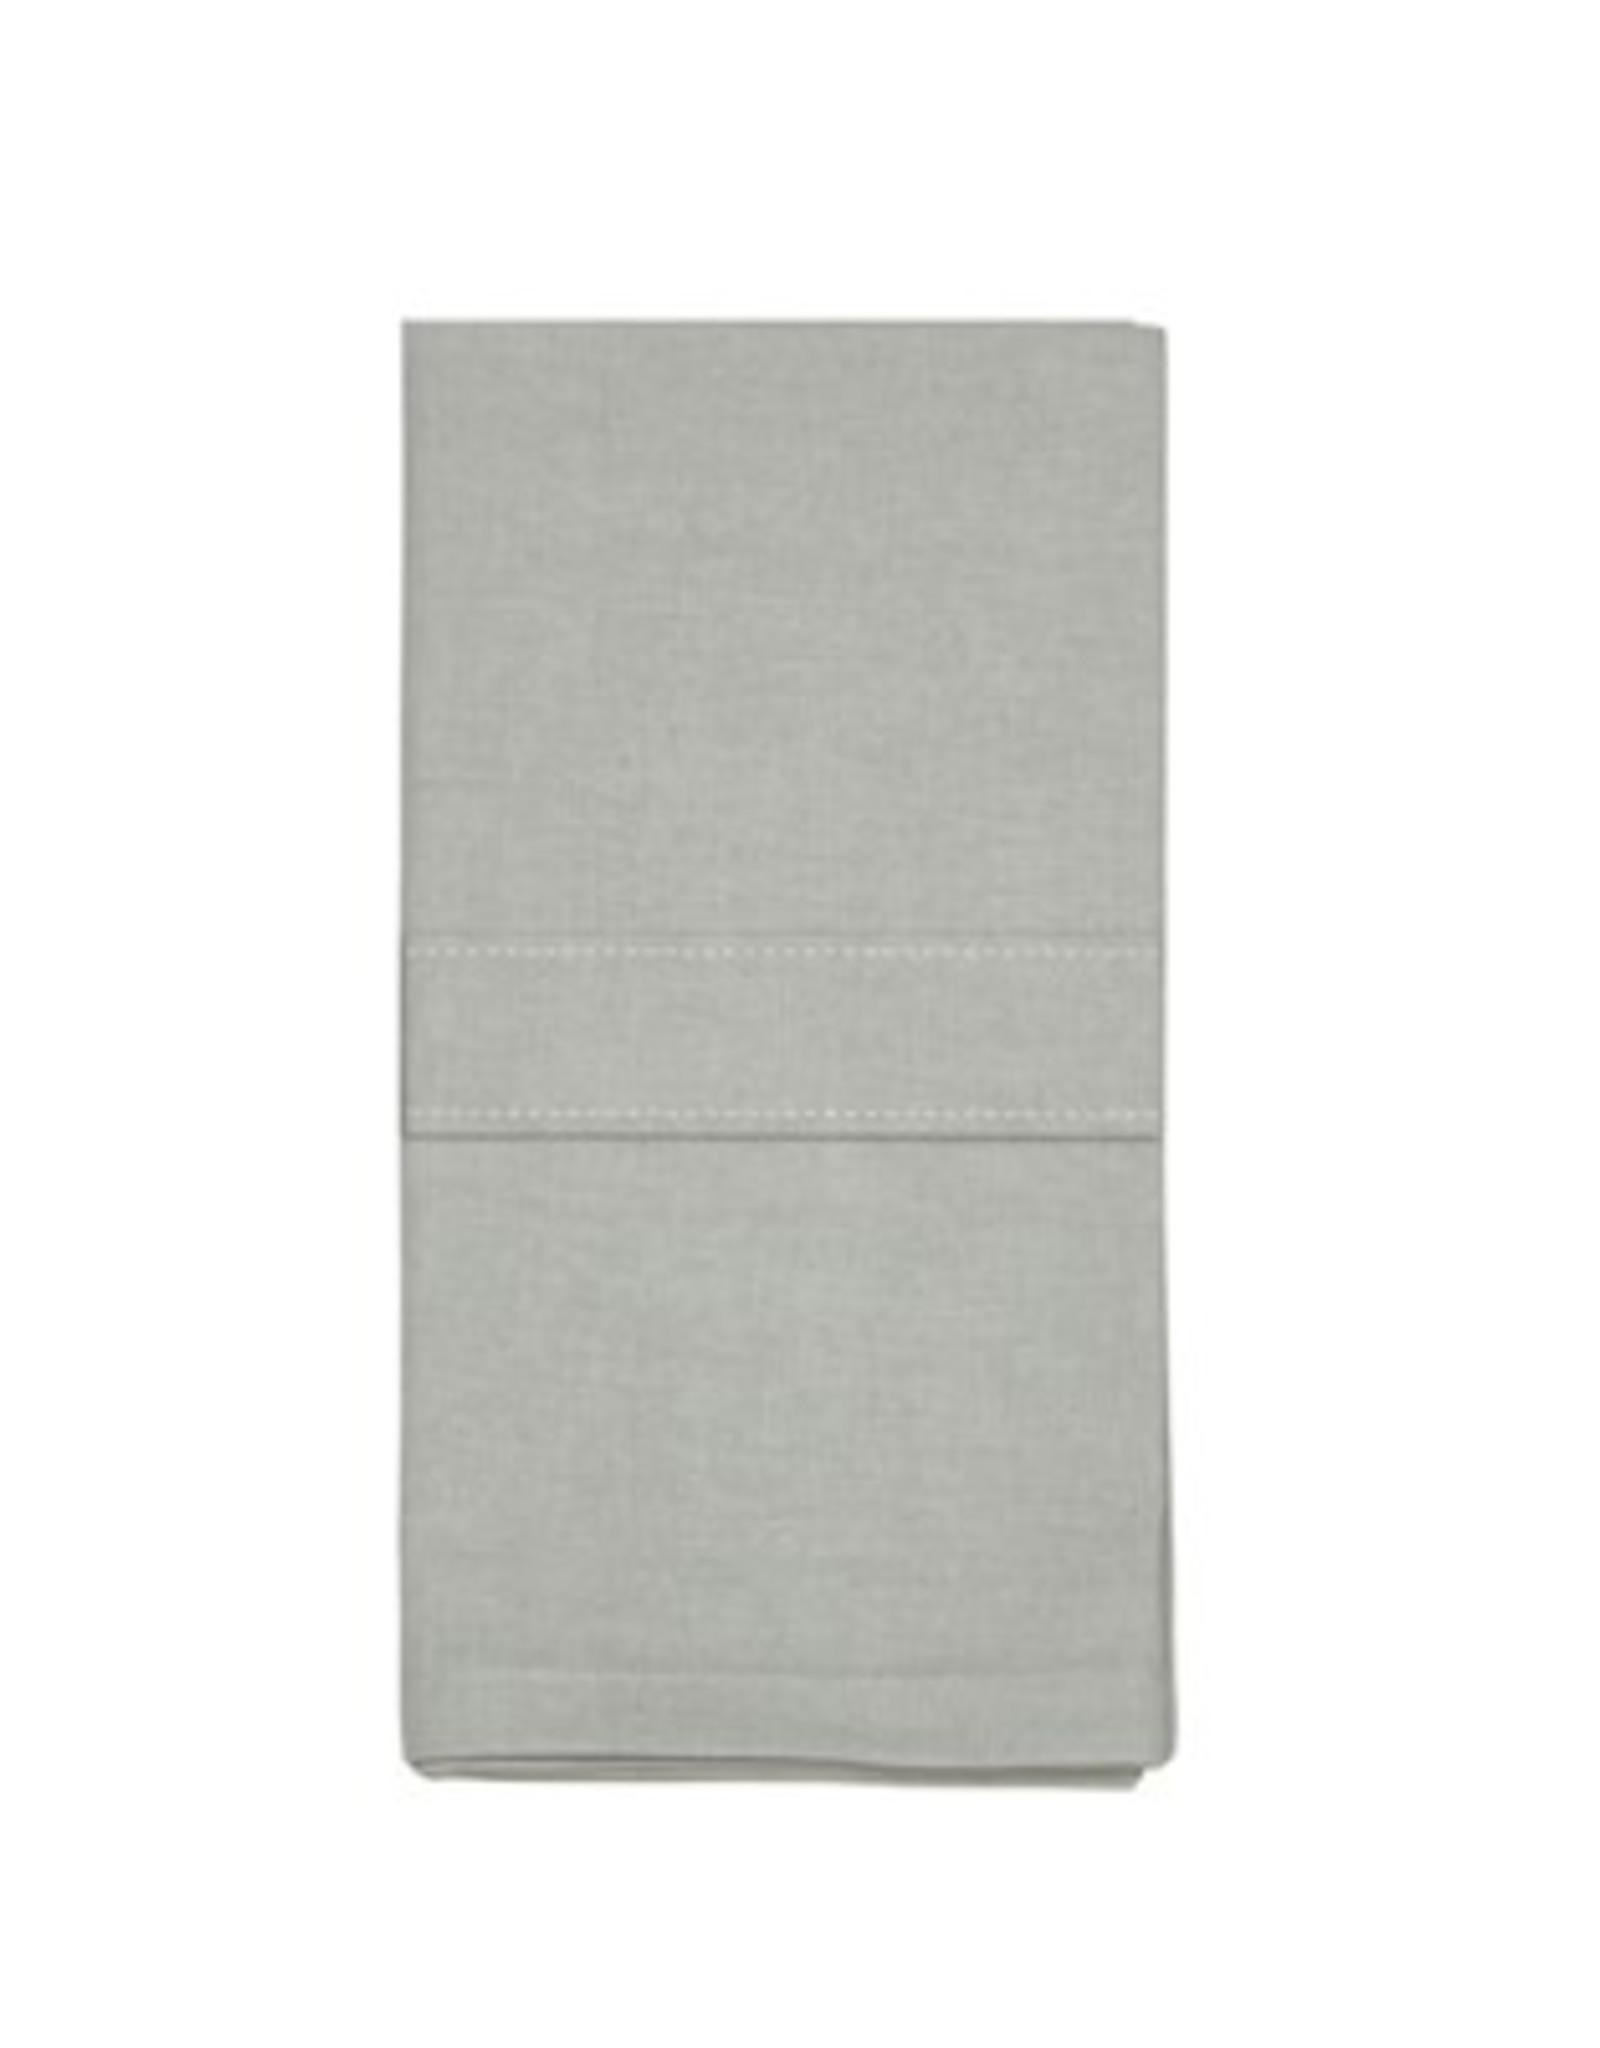 Napkins Harman Stock Solid Set of 4 Grey